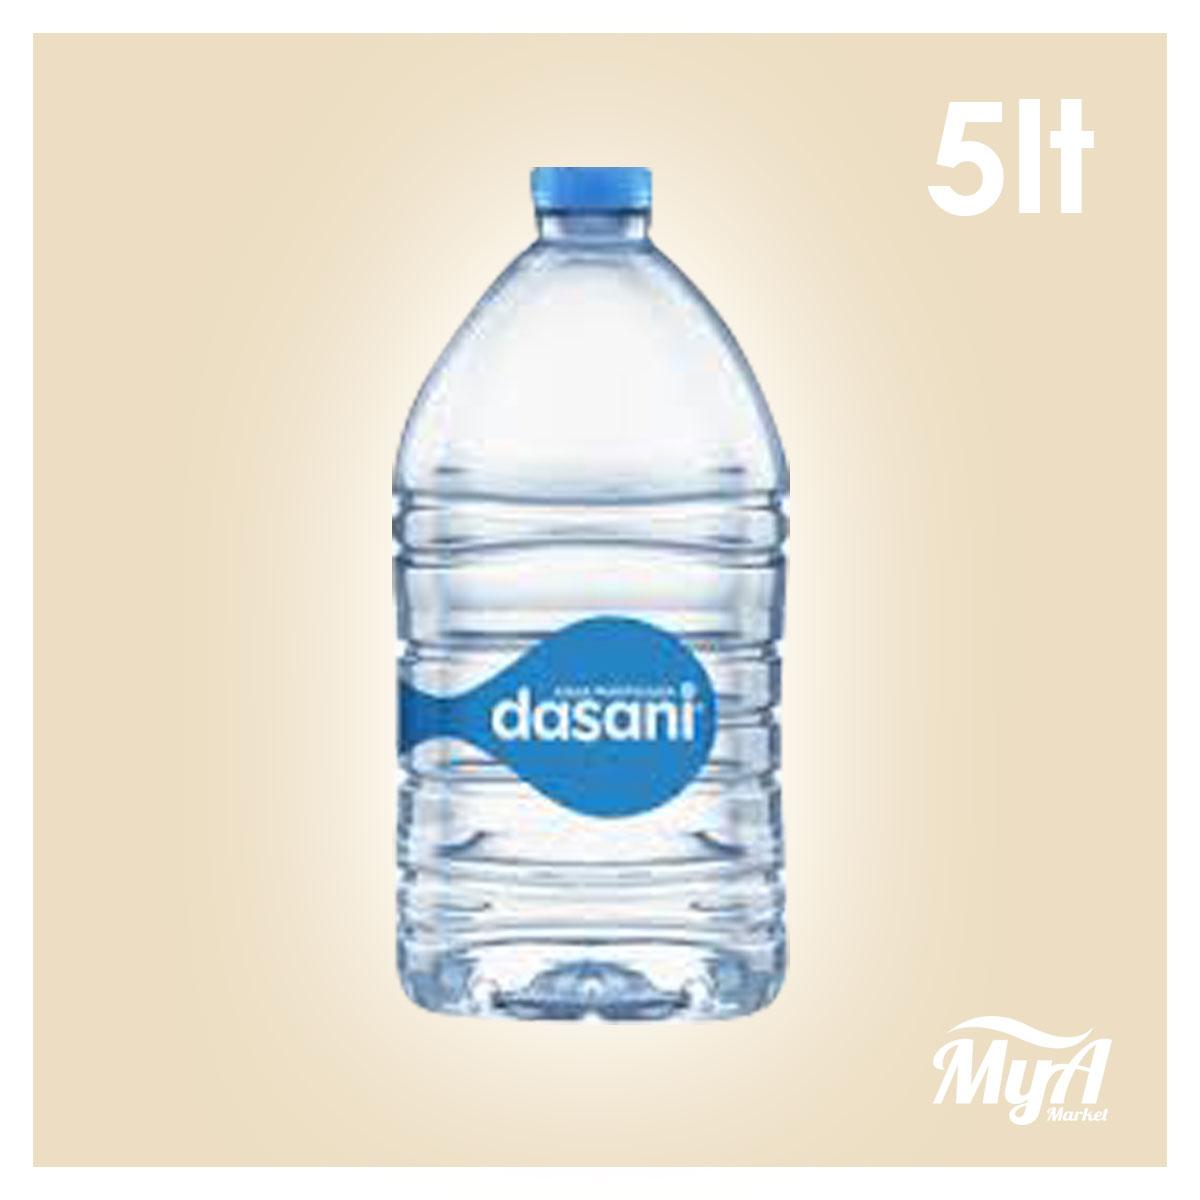 Agua Dasani 5Lt